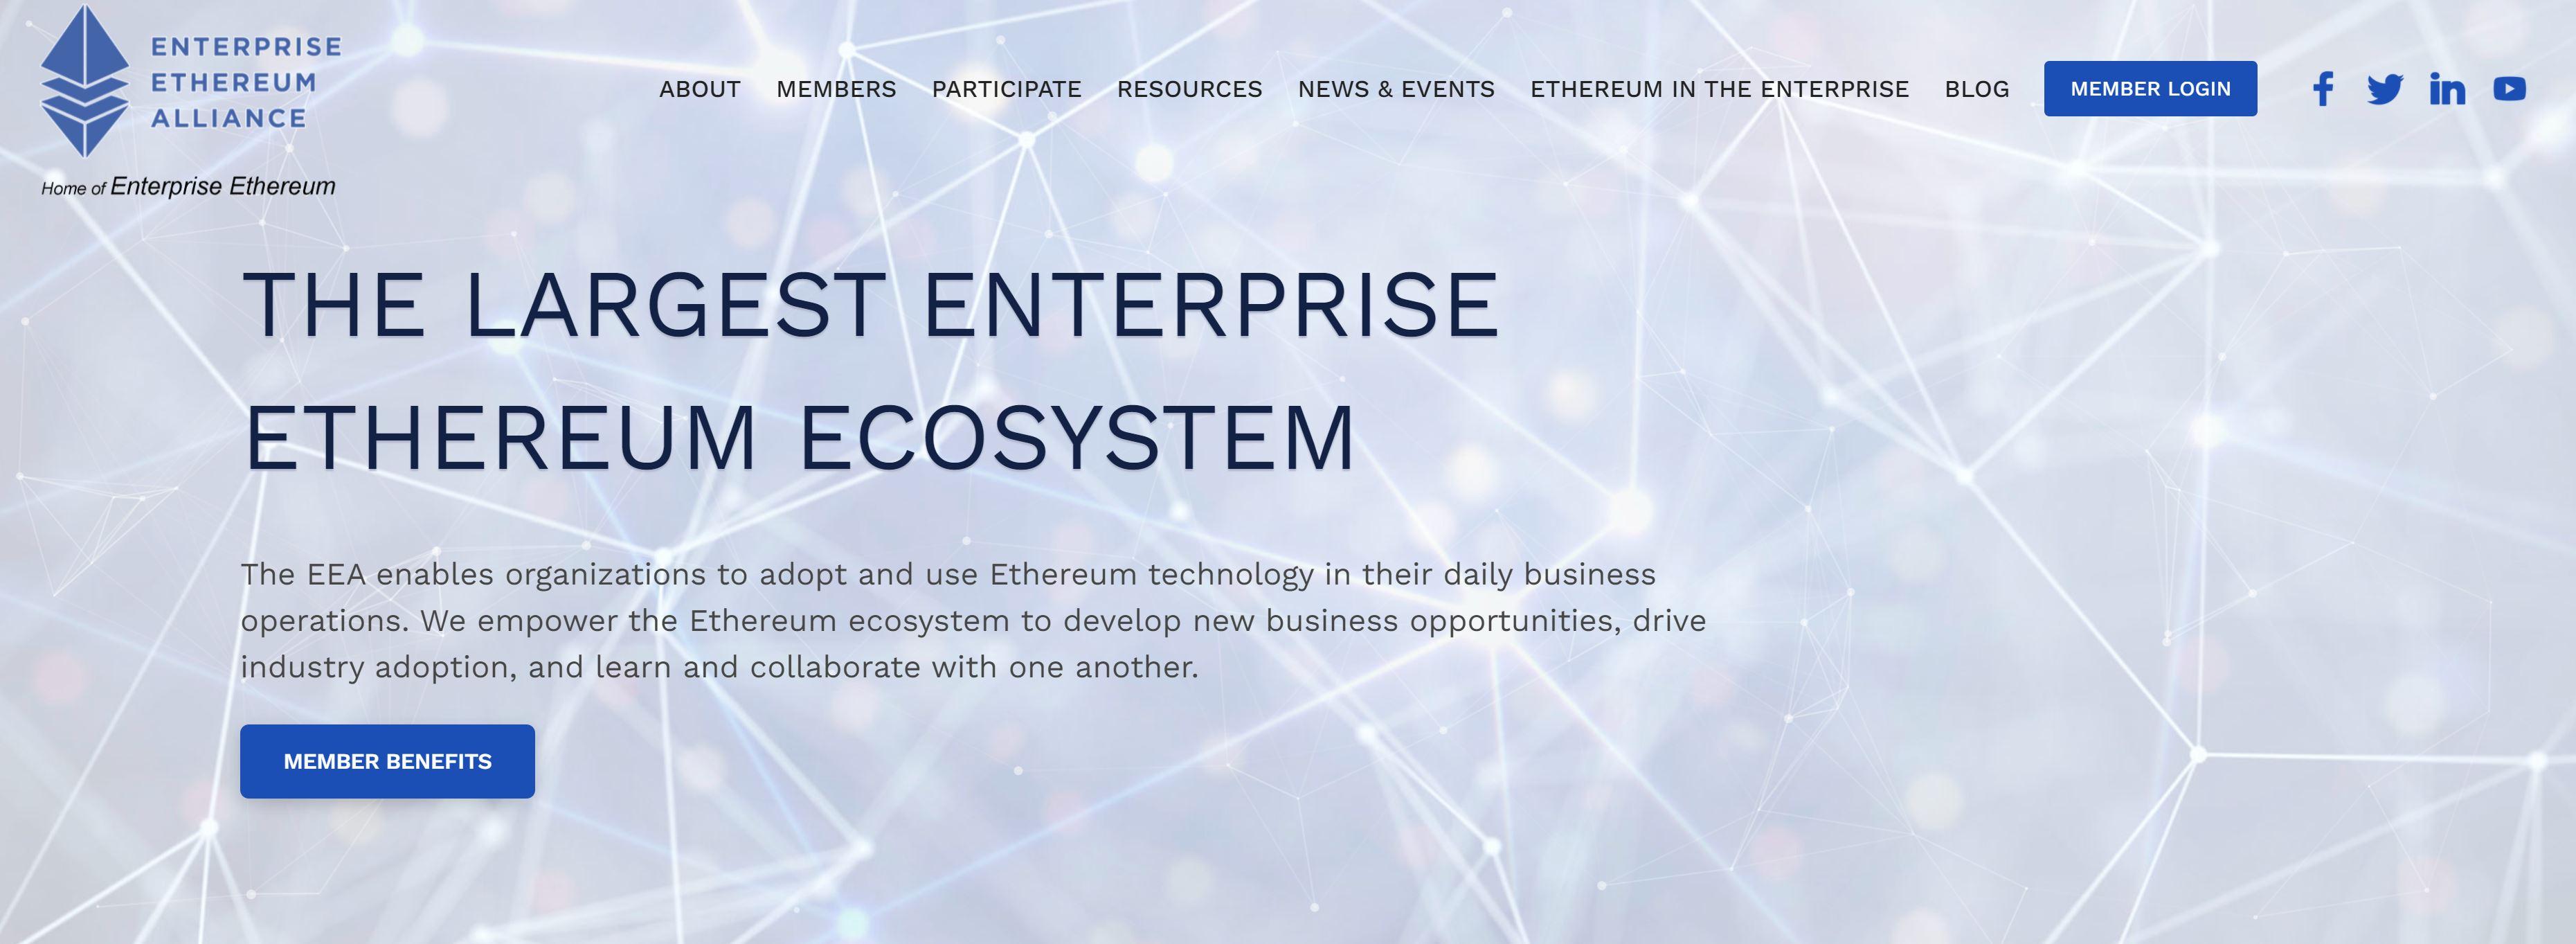 Enterprise Ethereum Alliance-website